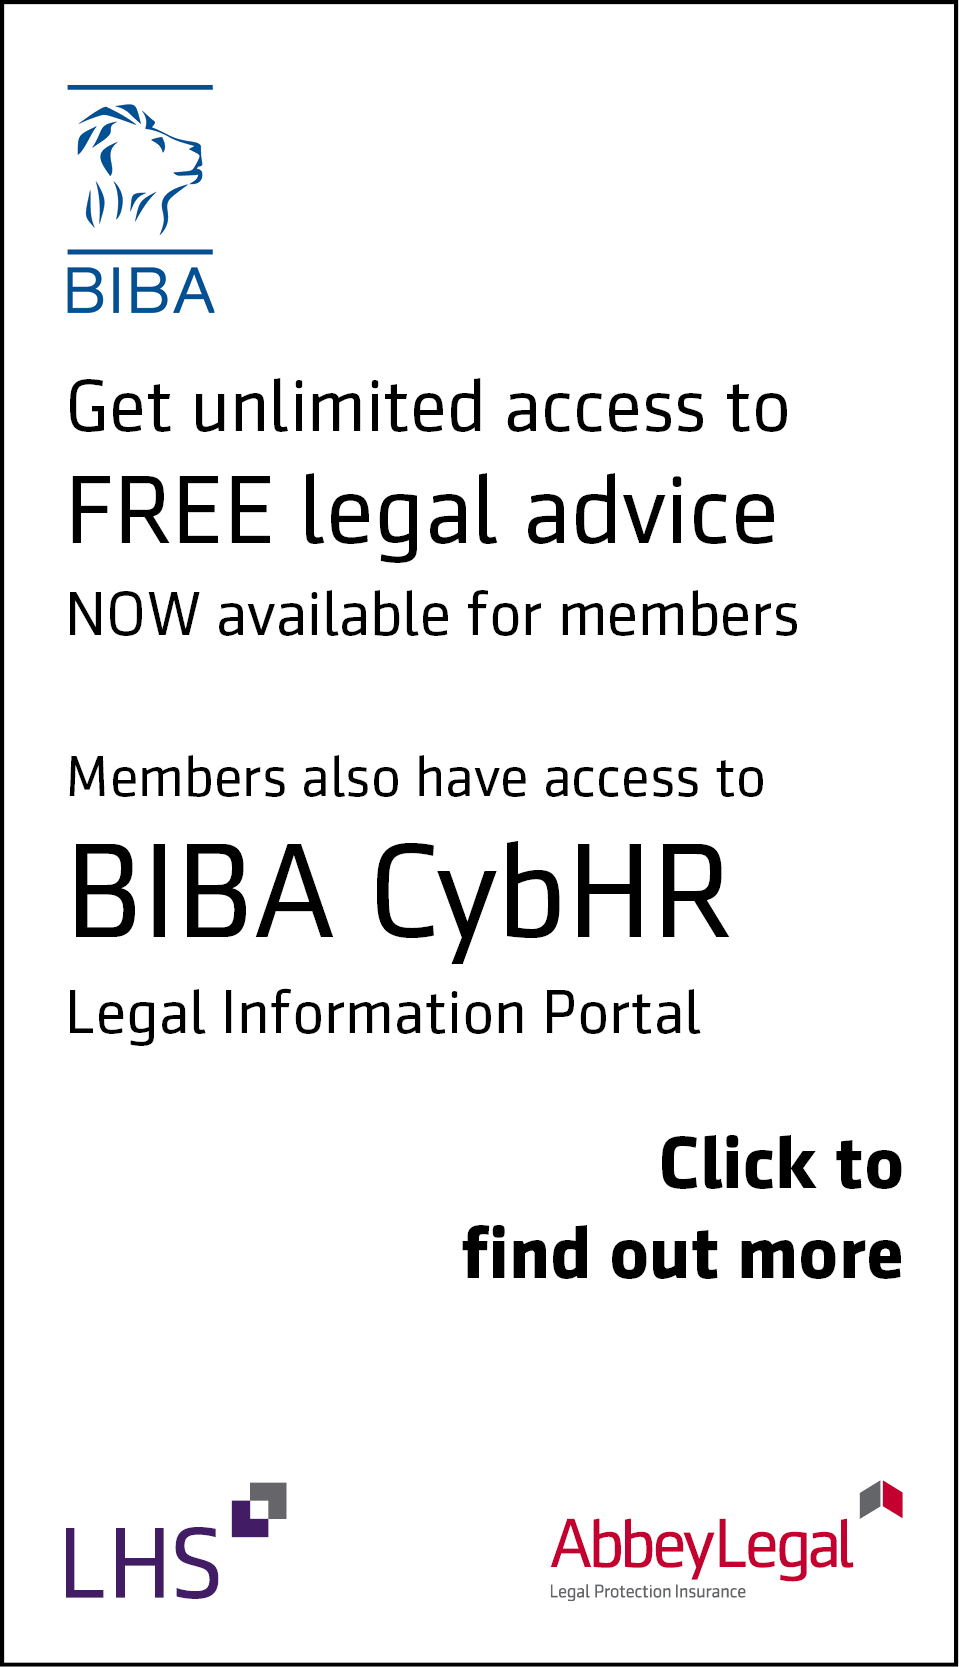 BIBA CybHR advert